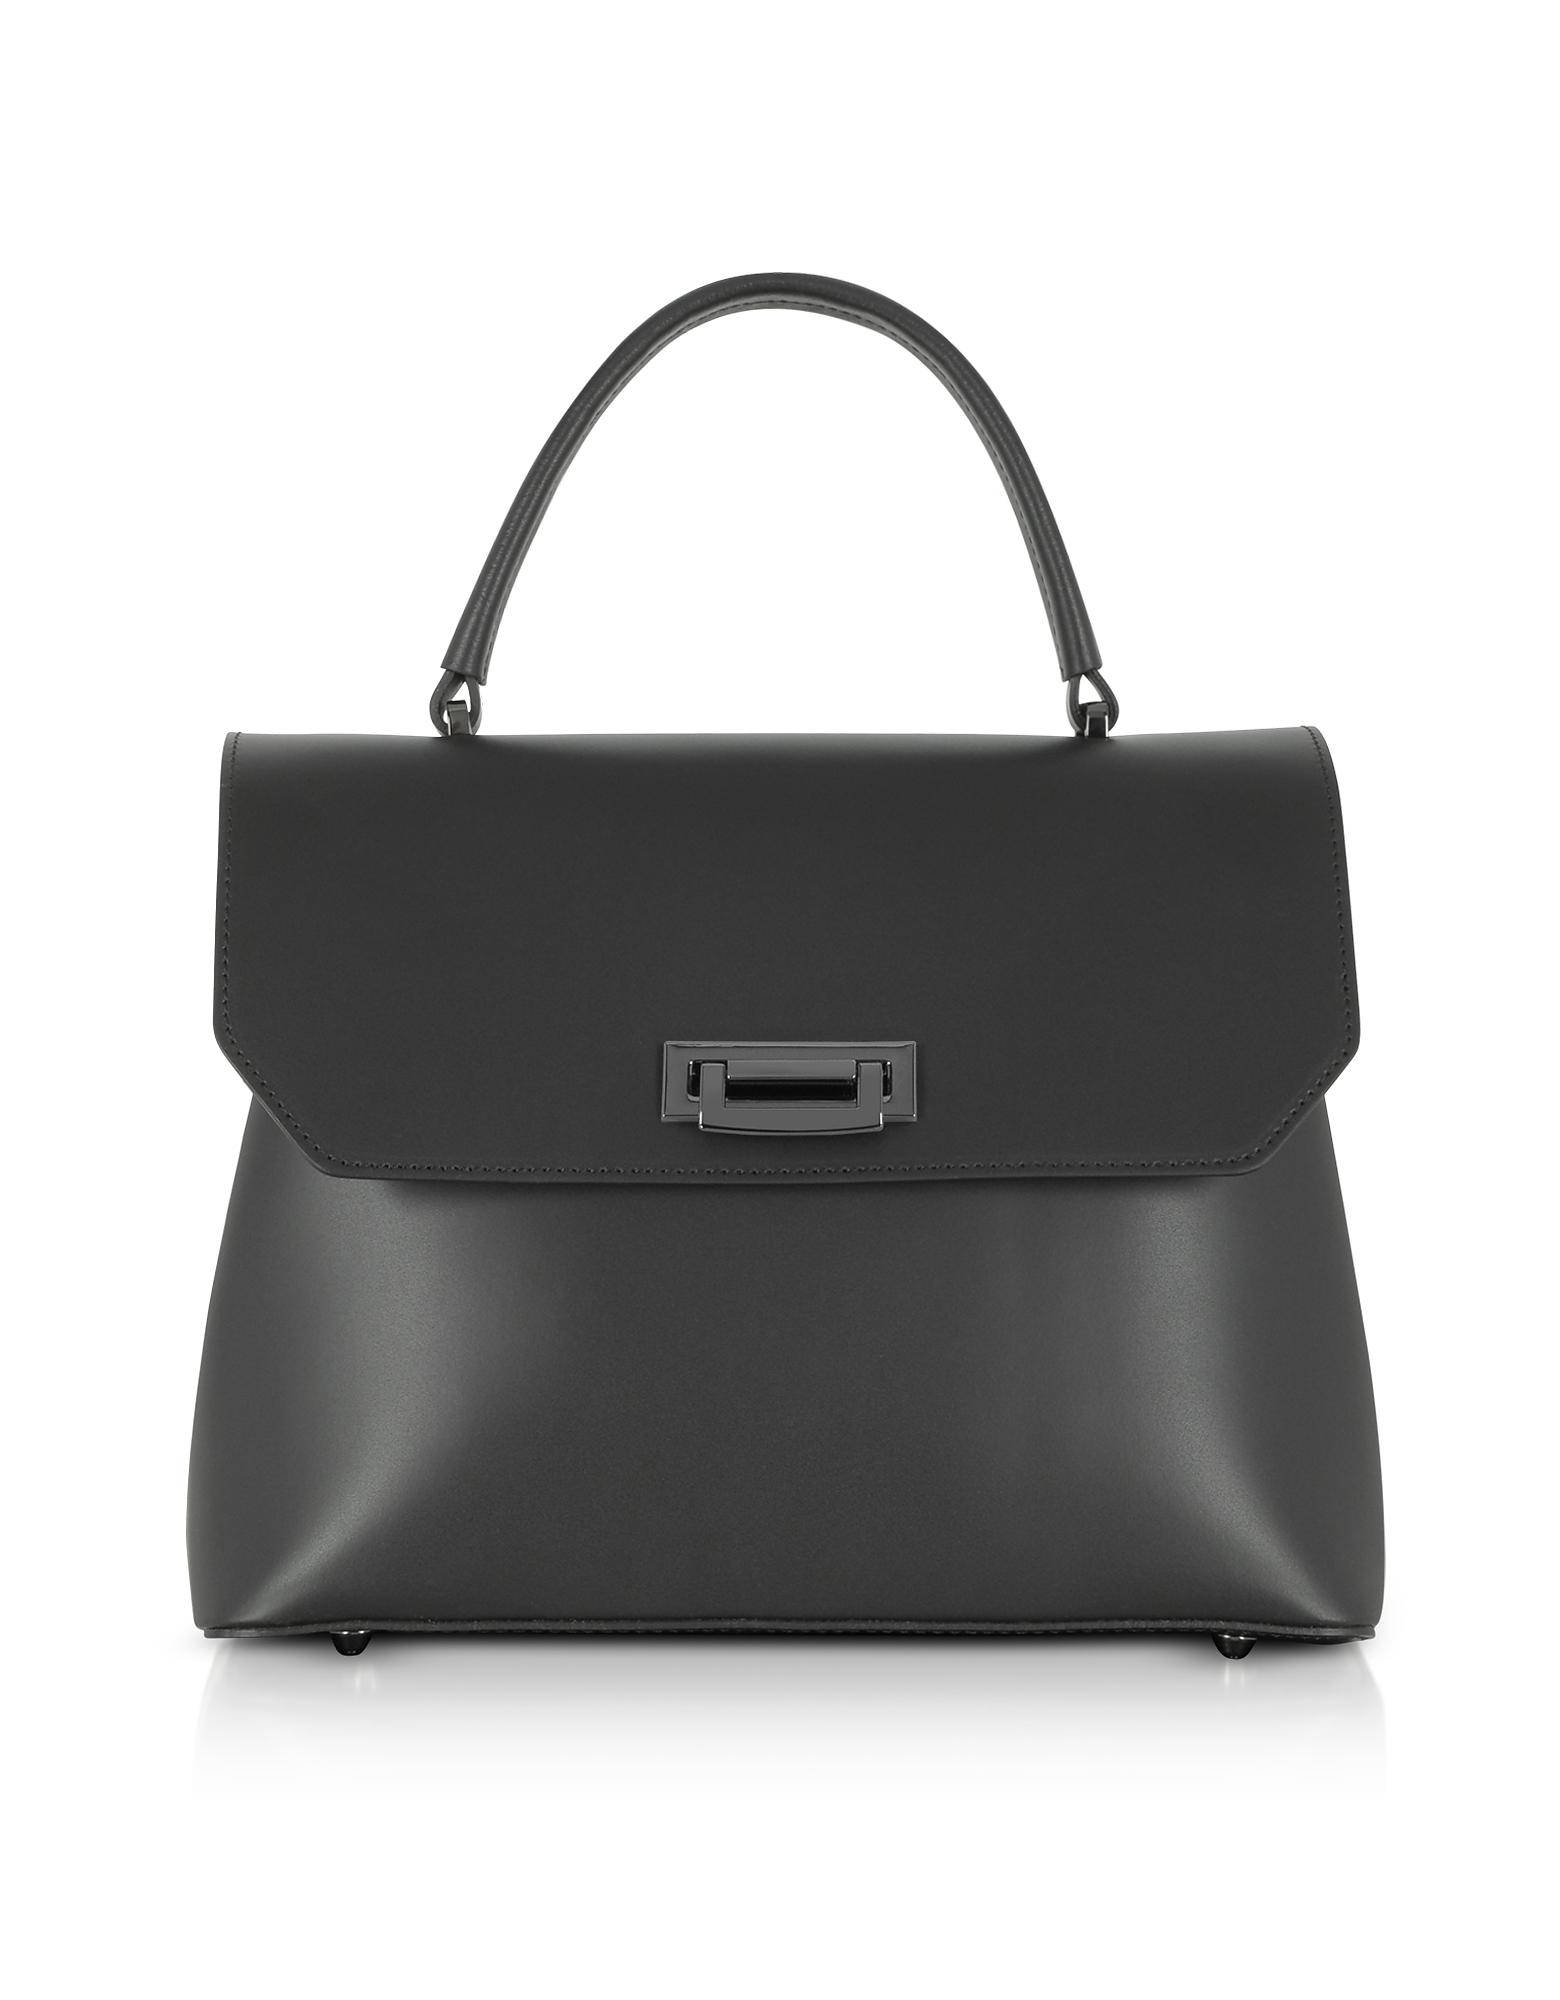 Lutèce Cuir Moyen Top Handle Satchel Bag